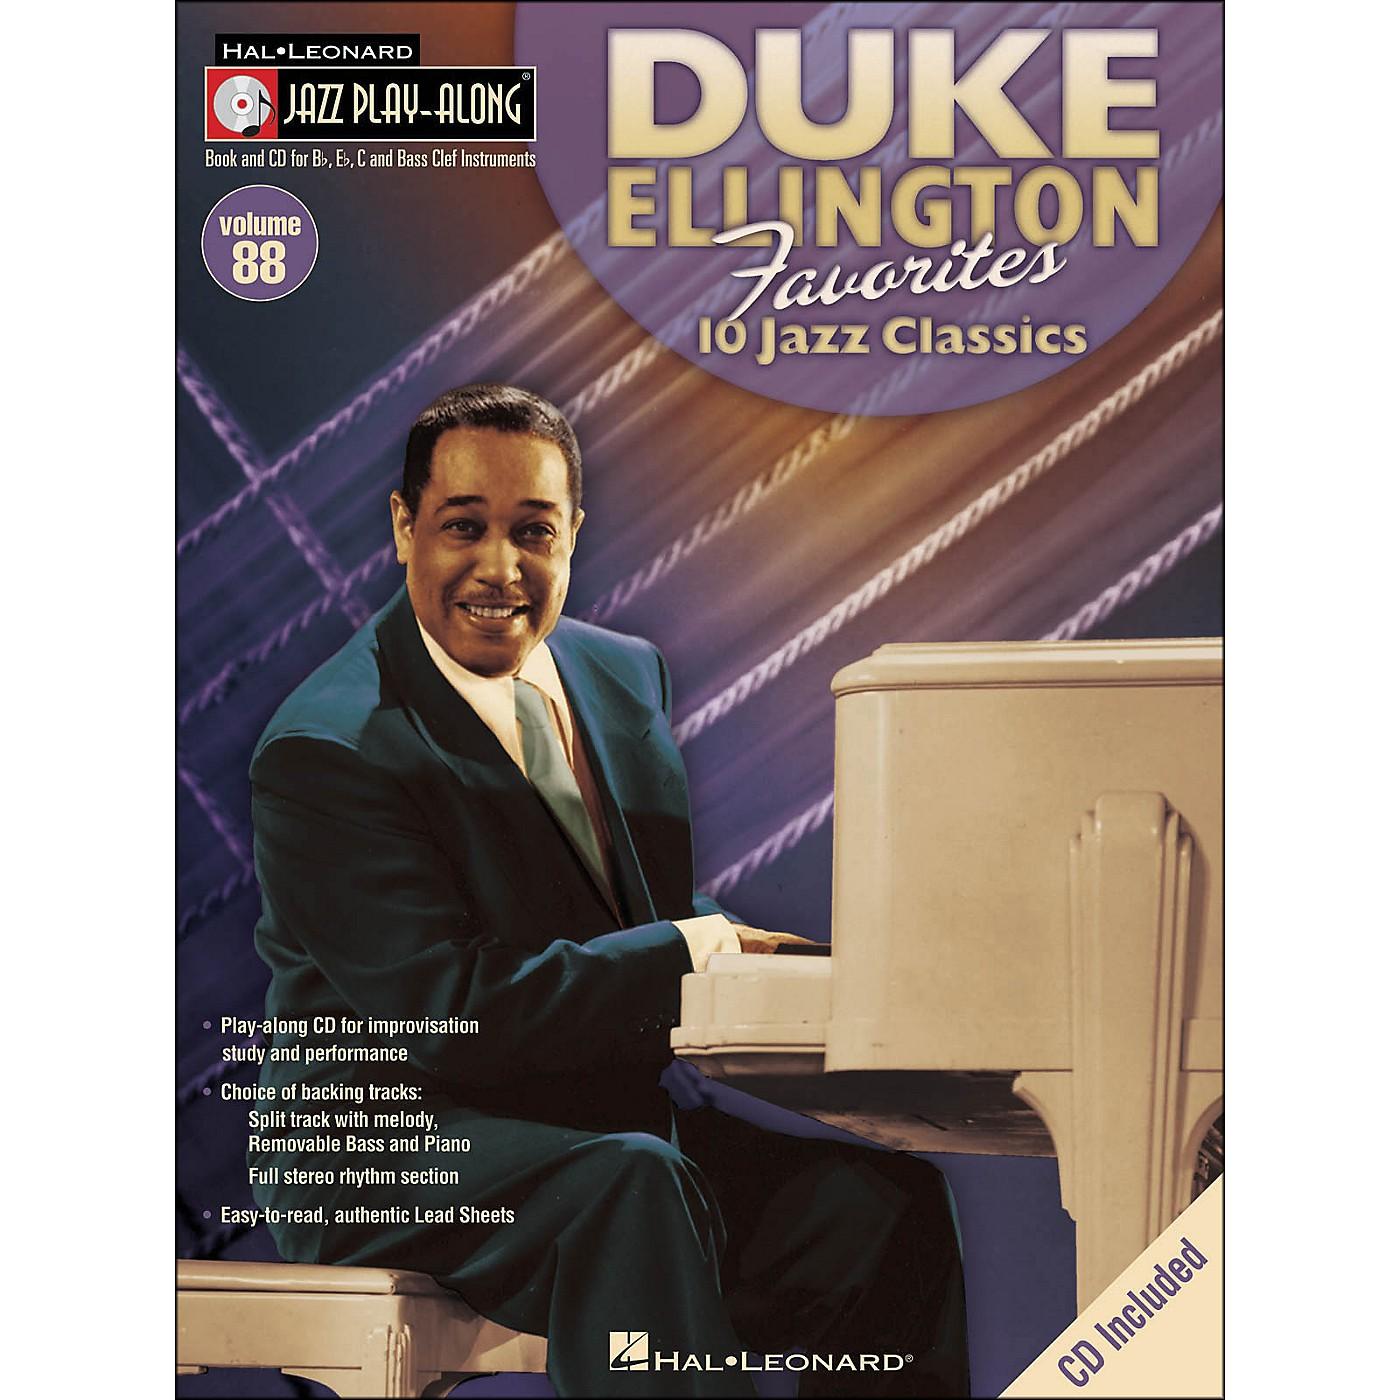 Hal Leonard Duke Ellington Favorites - Jazz Play-Along Volume 88 (CD/Pkg) thumbnail